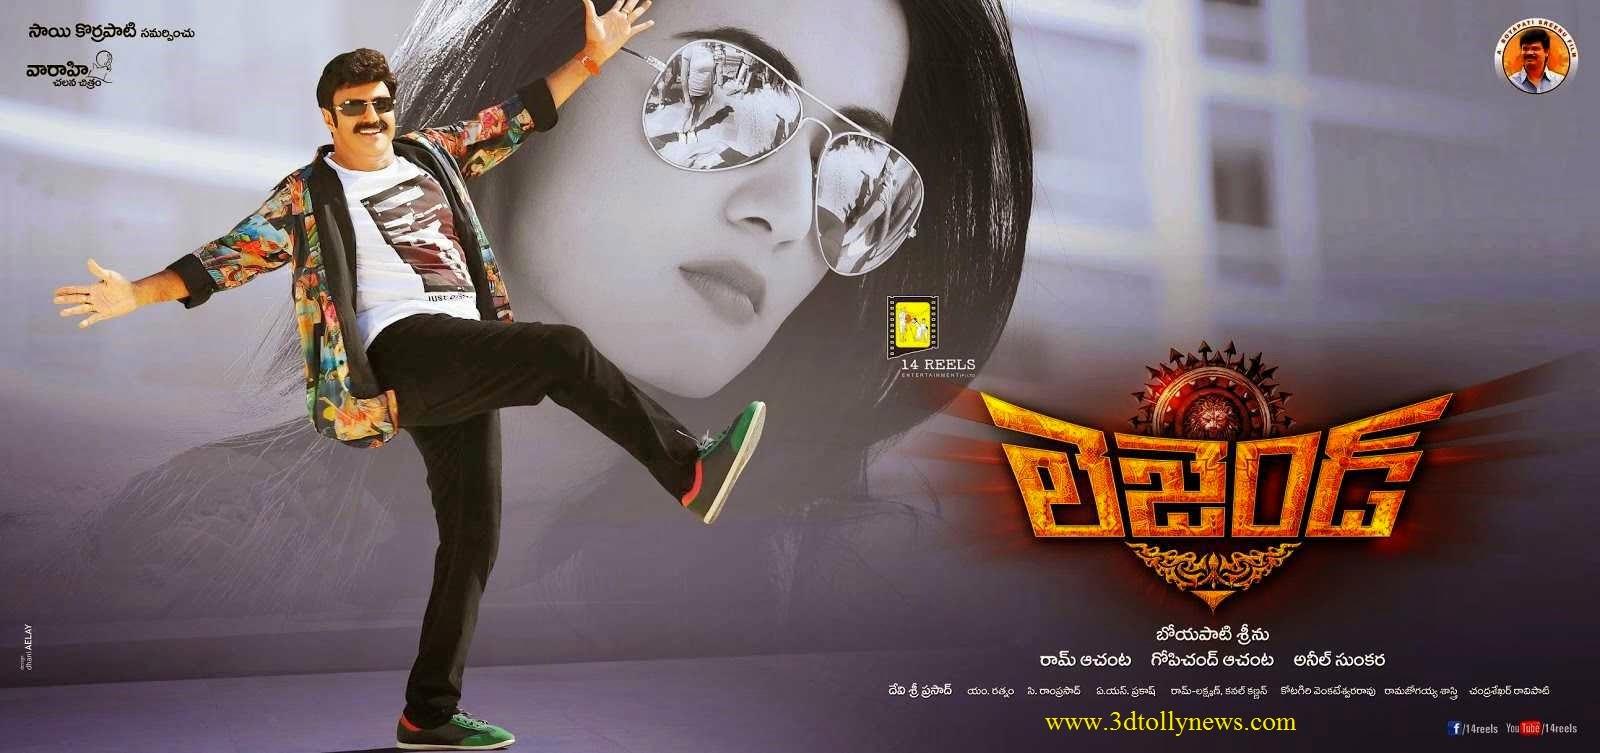 Balakrishna-Radhika-Apte-Legend-First-Look-Wallpapers-10